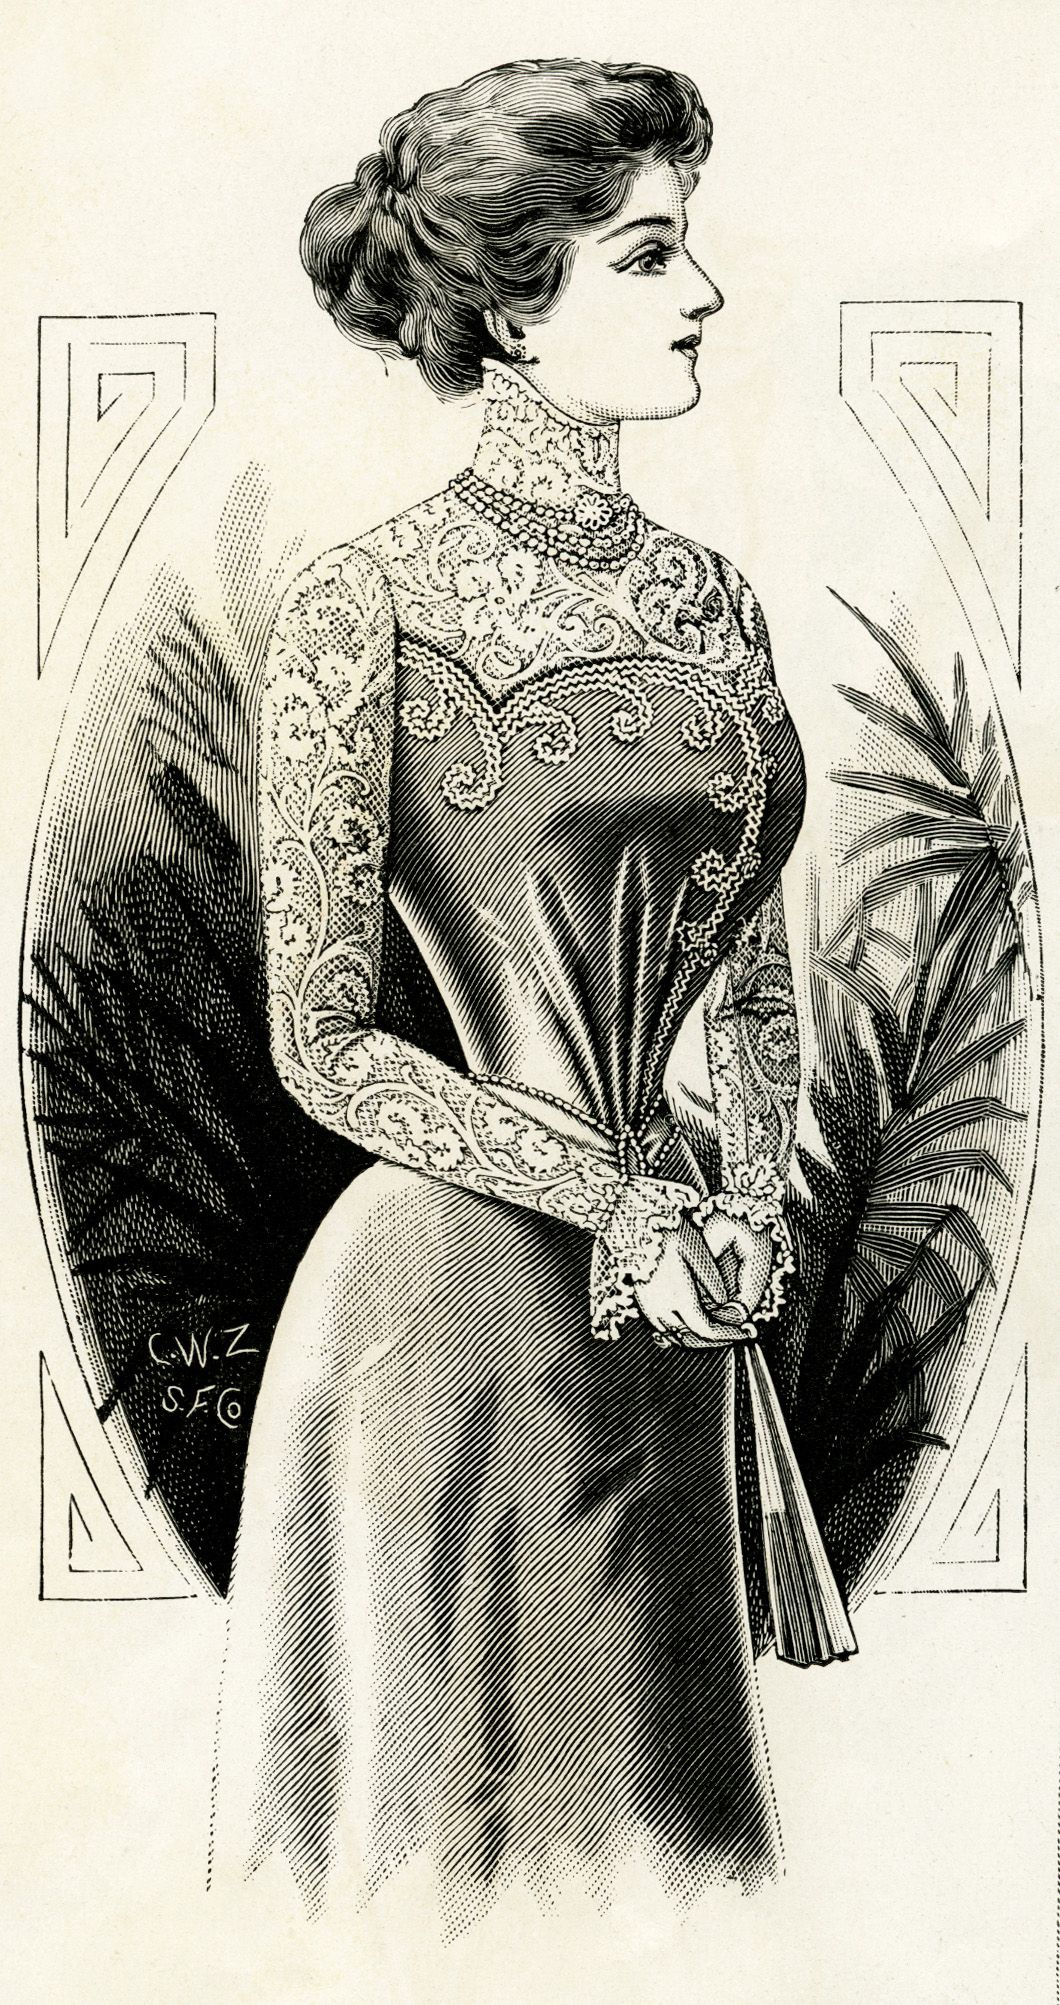 hight resolution of victorian clipart public domain public domain digital image graphic design resource antique designer